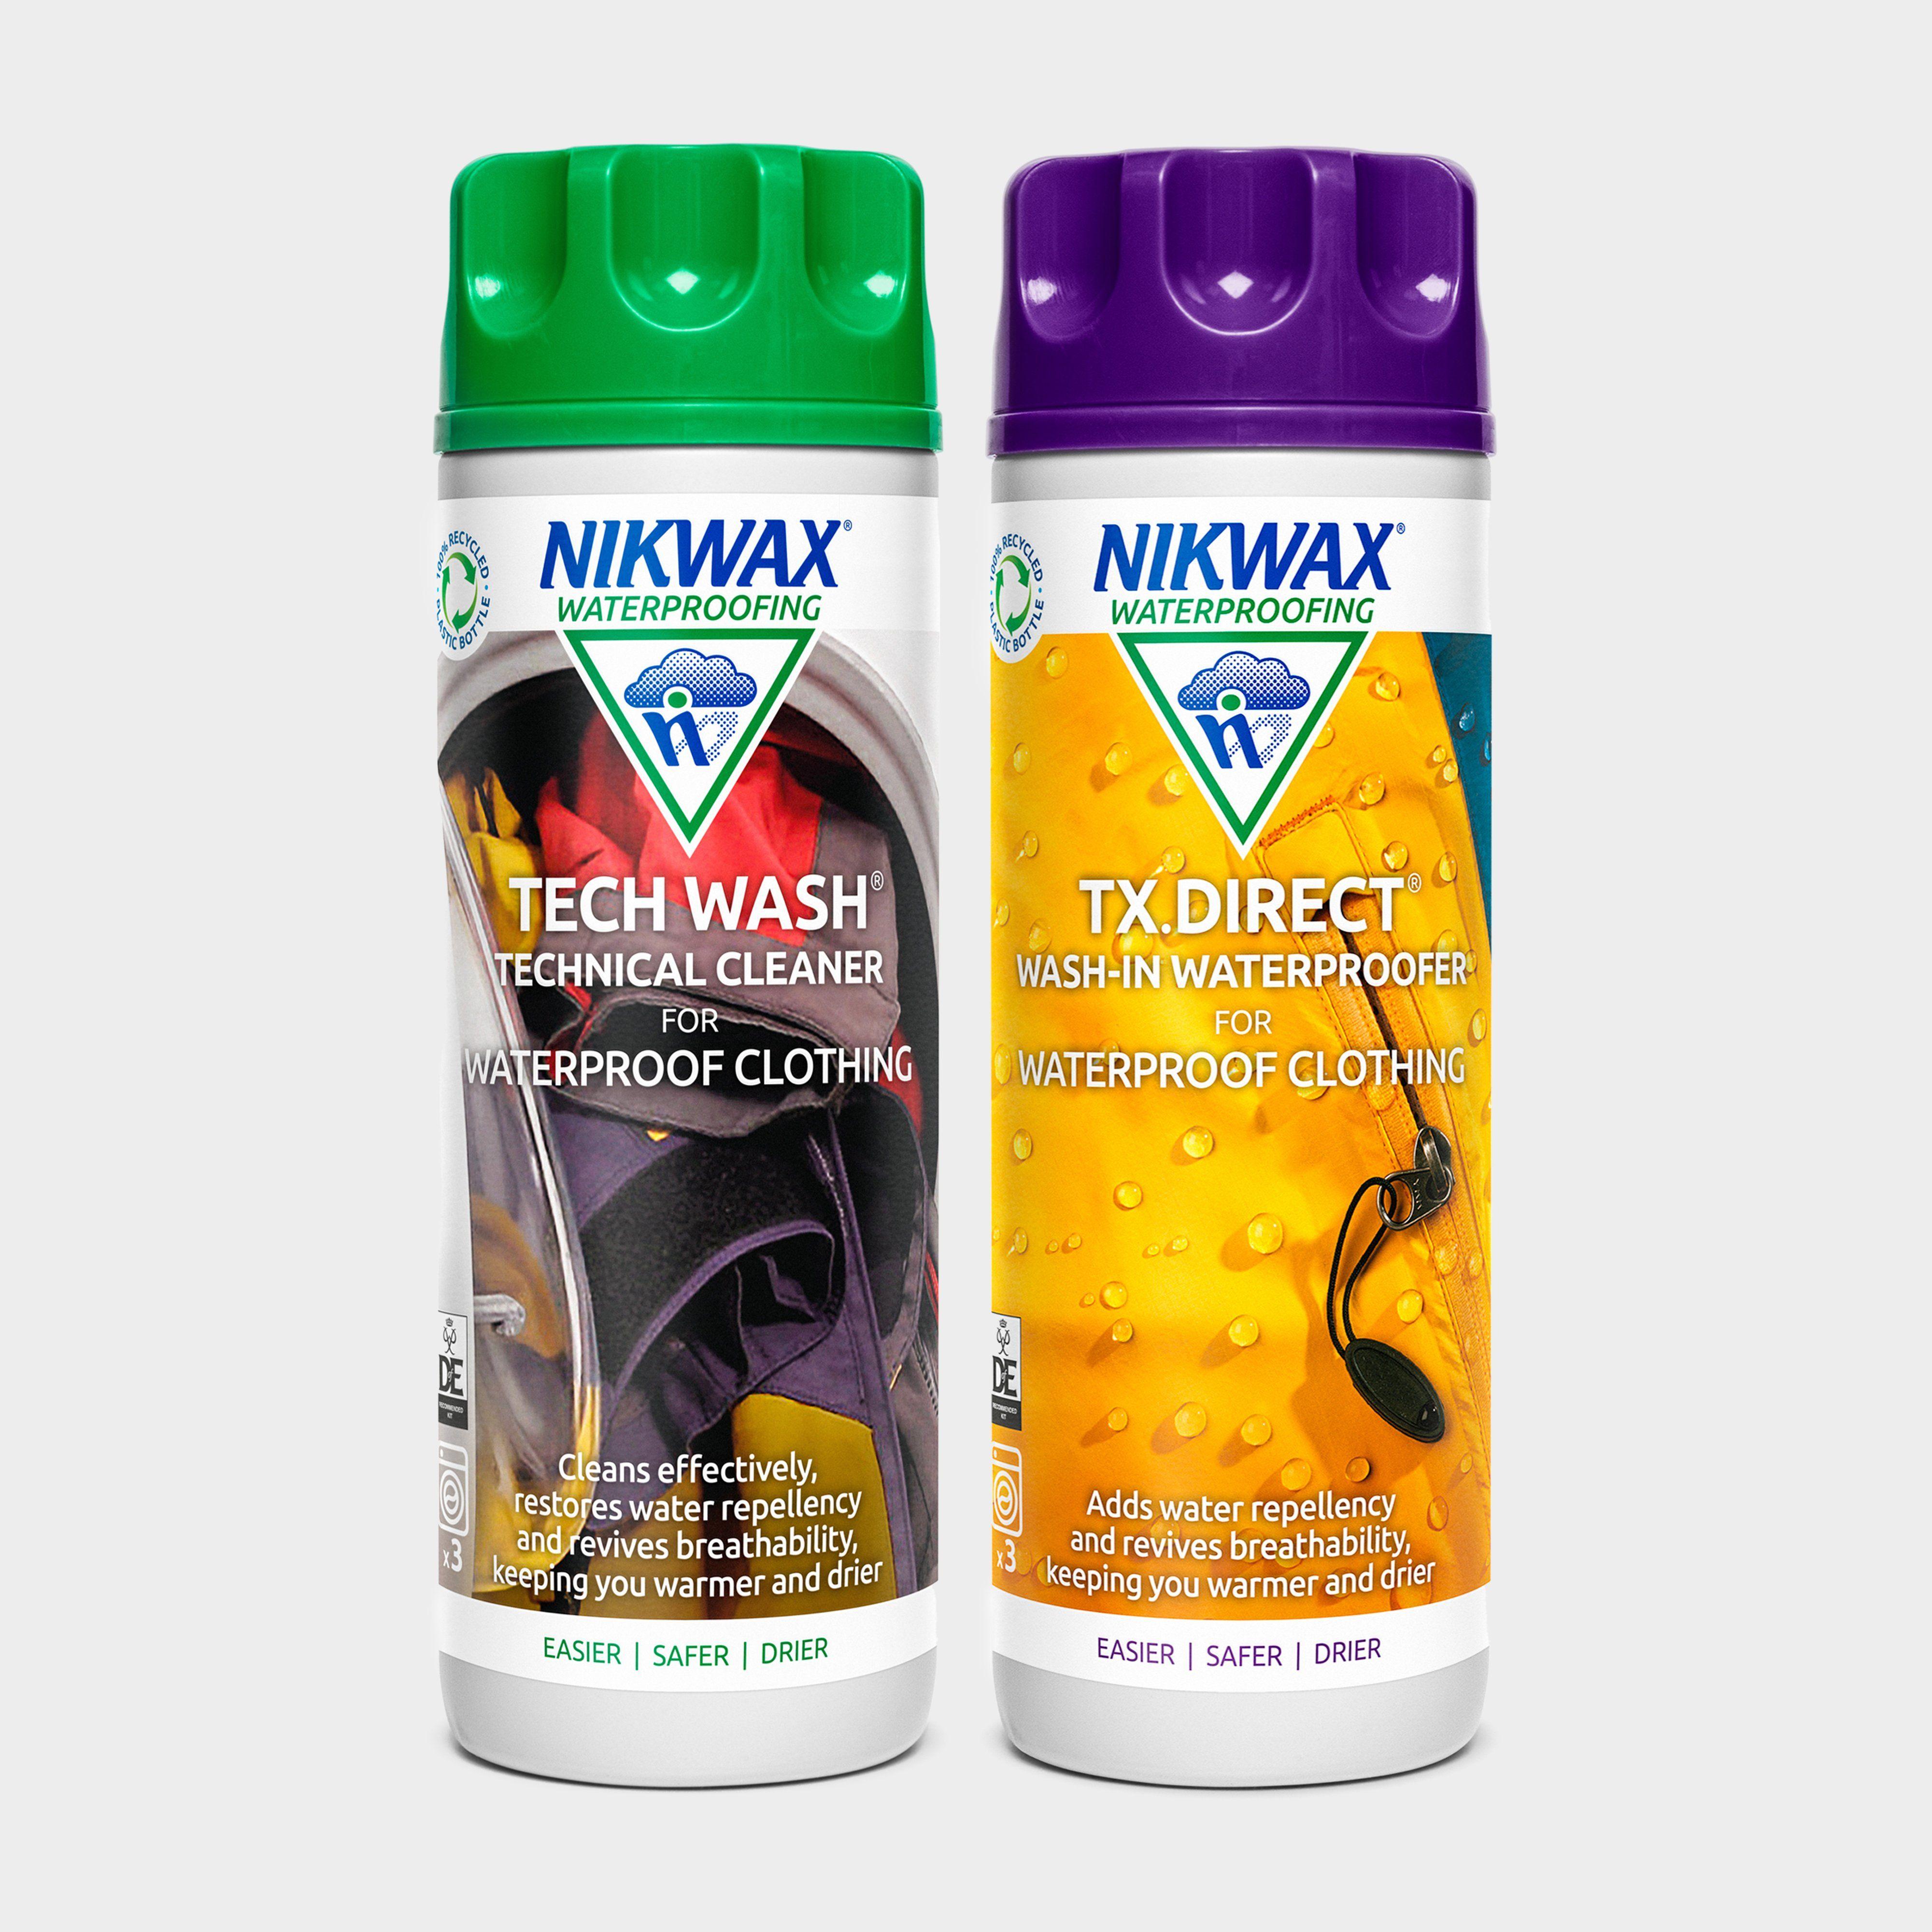 NIKWAX Tech Wash and TX Direct Twin Pack